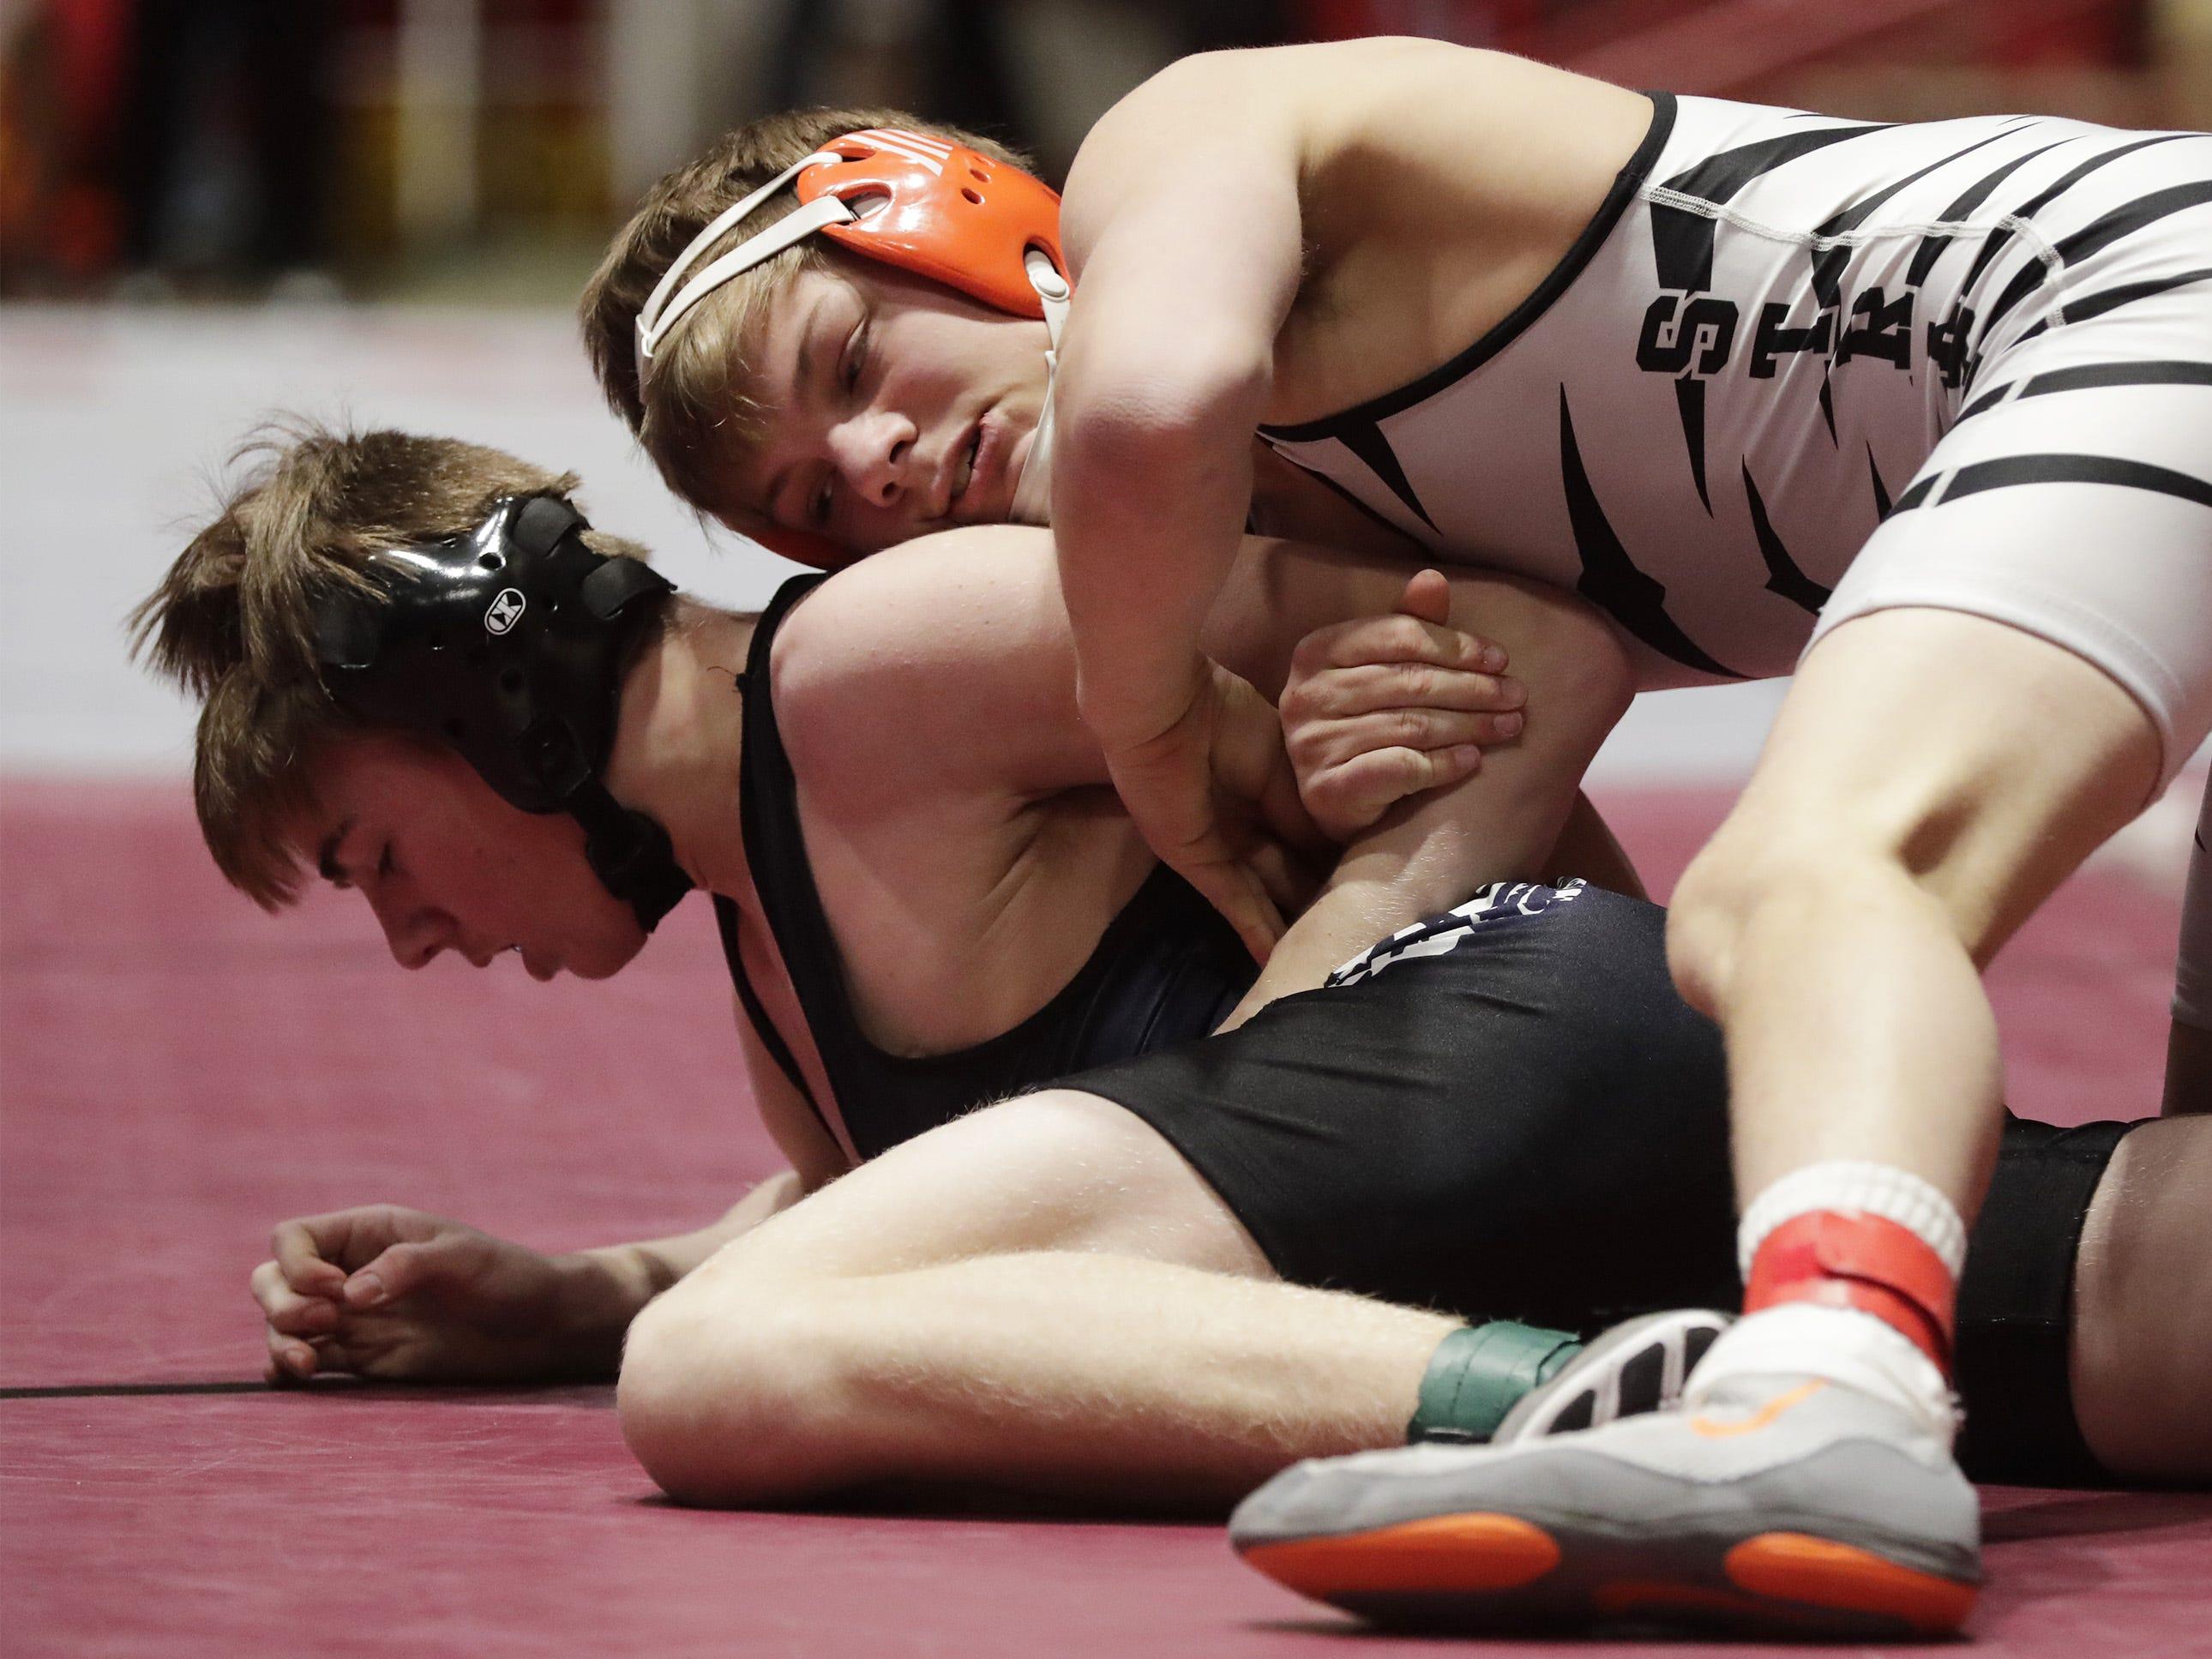 Stratford's Jacob Heiden keeps a grip on Random Lake's Hayden Scholler during a 138-pound match, Saturday, March 2, 2019, in Madison, Wis.